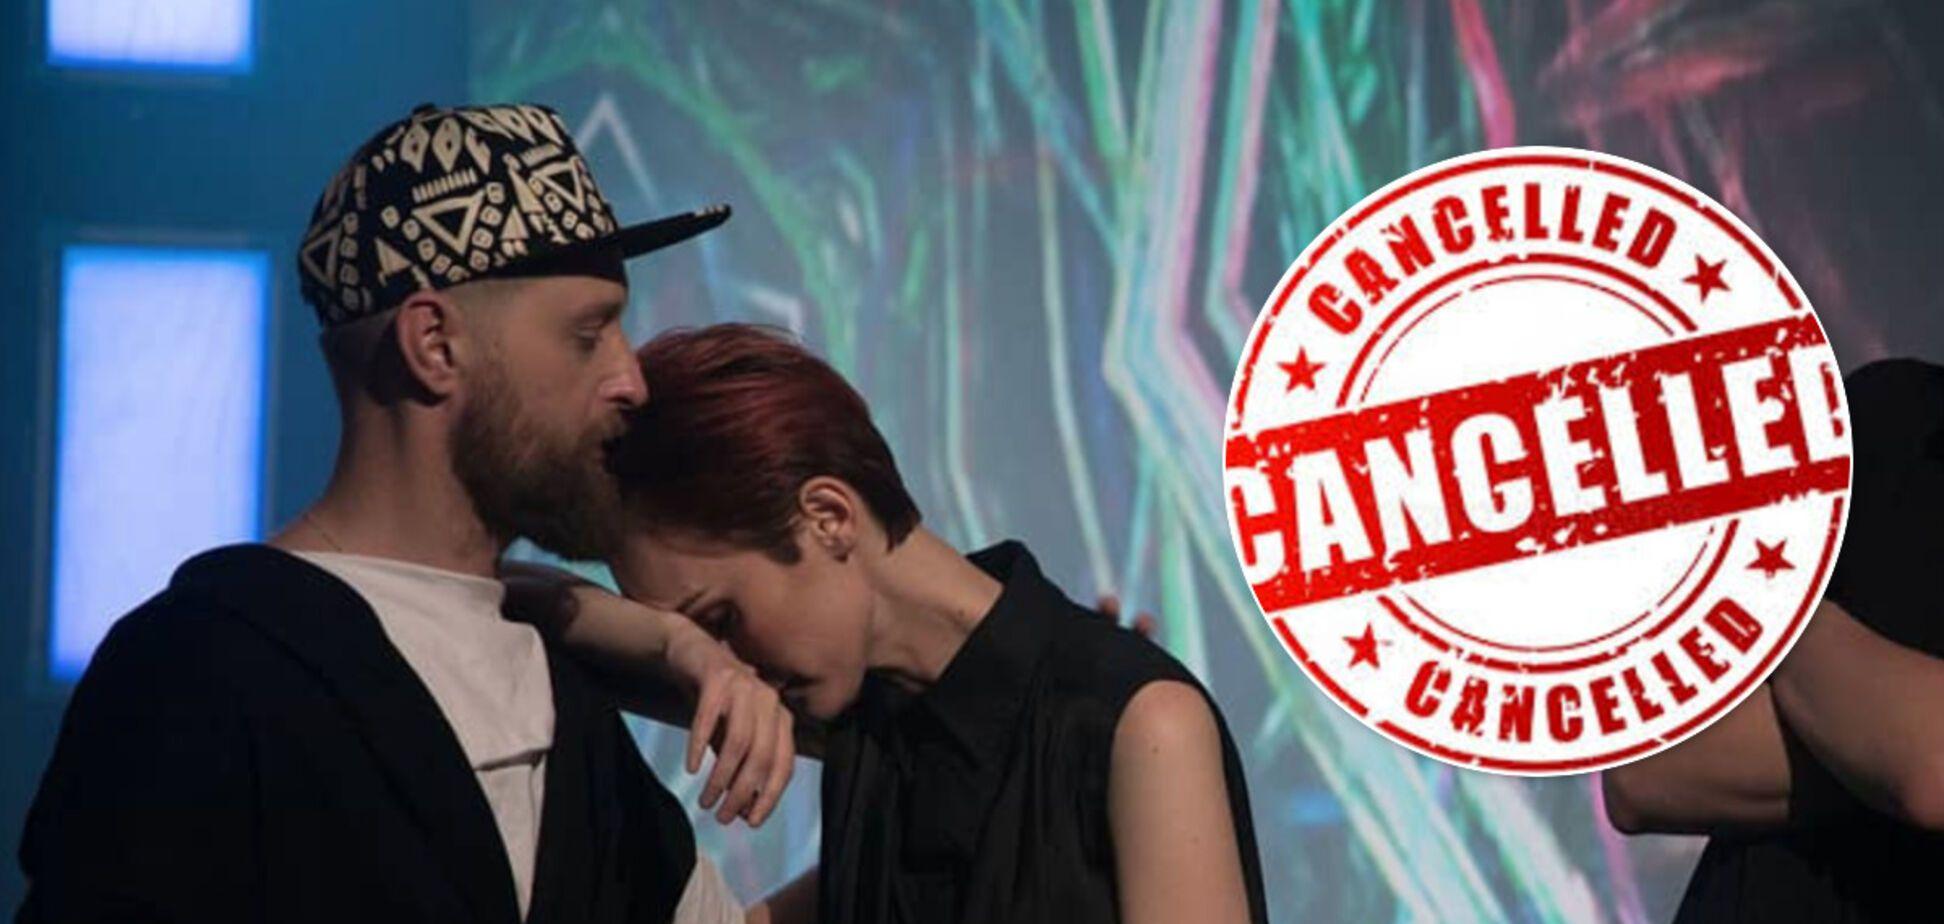 Go_A об отмене Евровидения